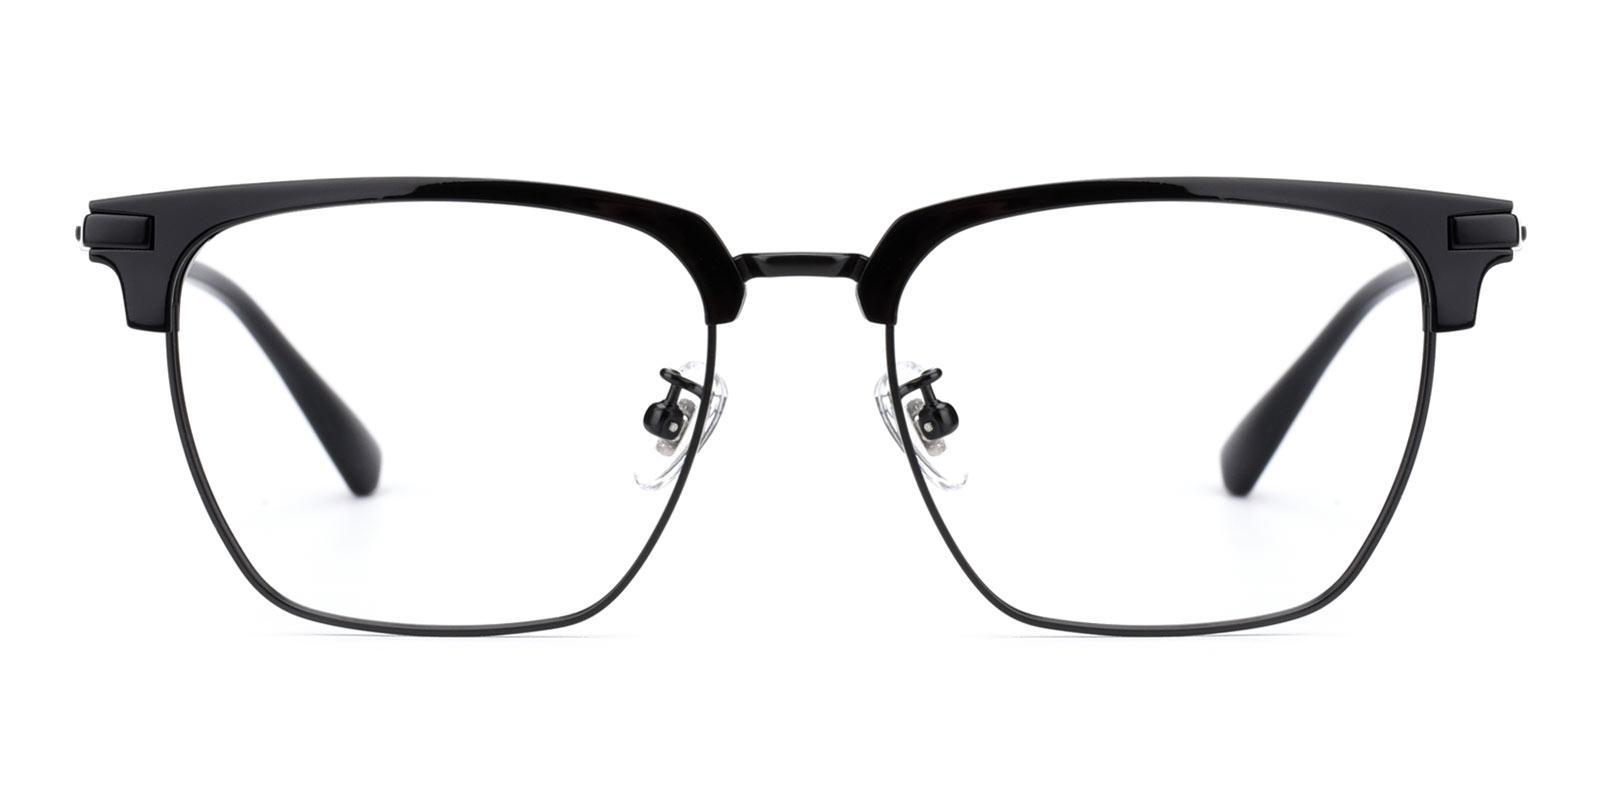 Signage-Black-Browline / Rectangle-Titanium-Eyeglasses-detail